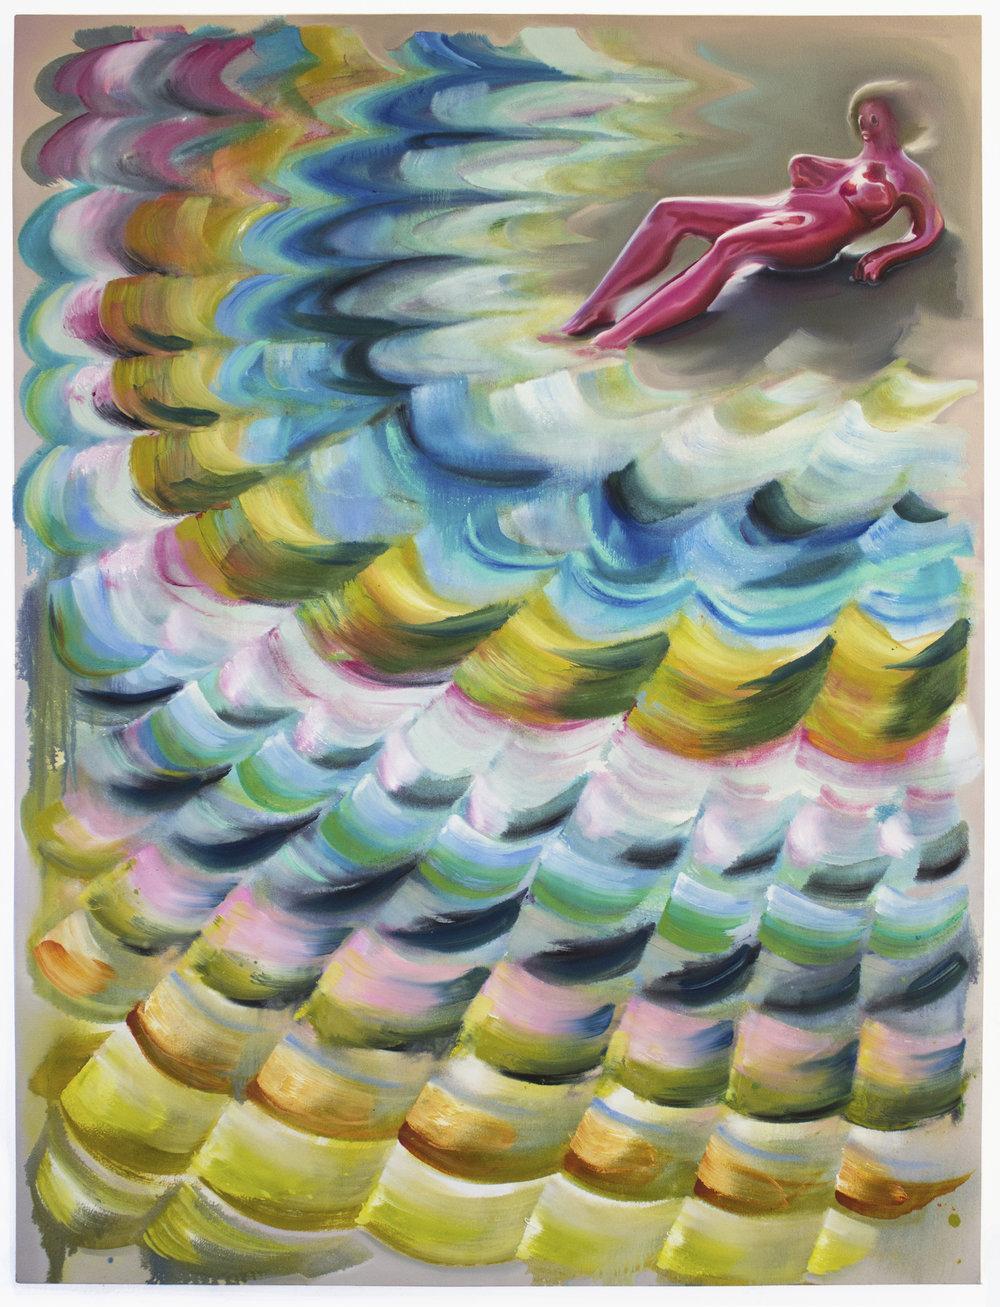 Lauren Satlowski  Wave Painting 07 ,2017 oil on canvas 36 x 48 x 4 in.